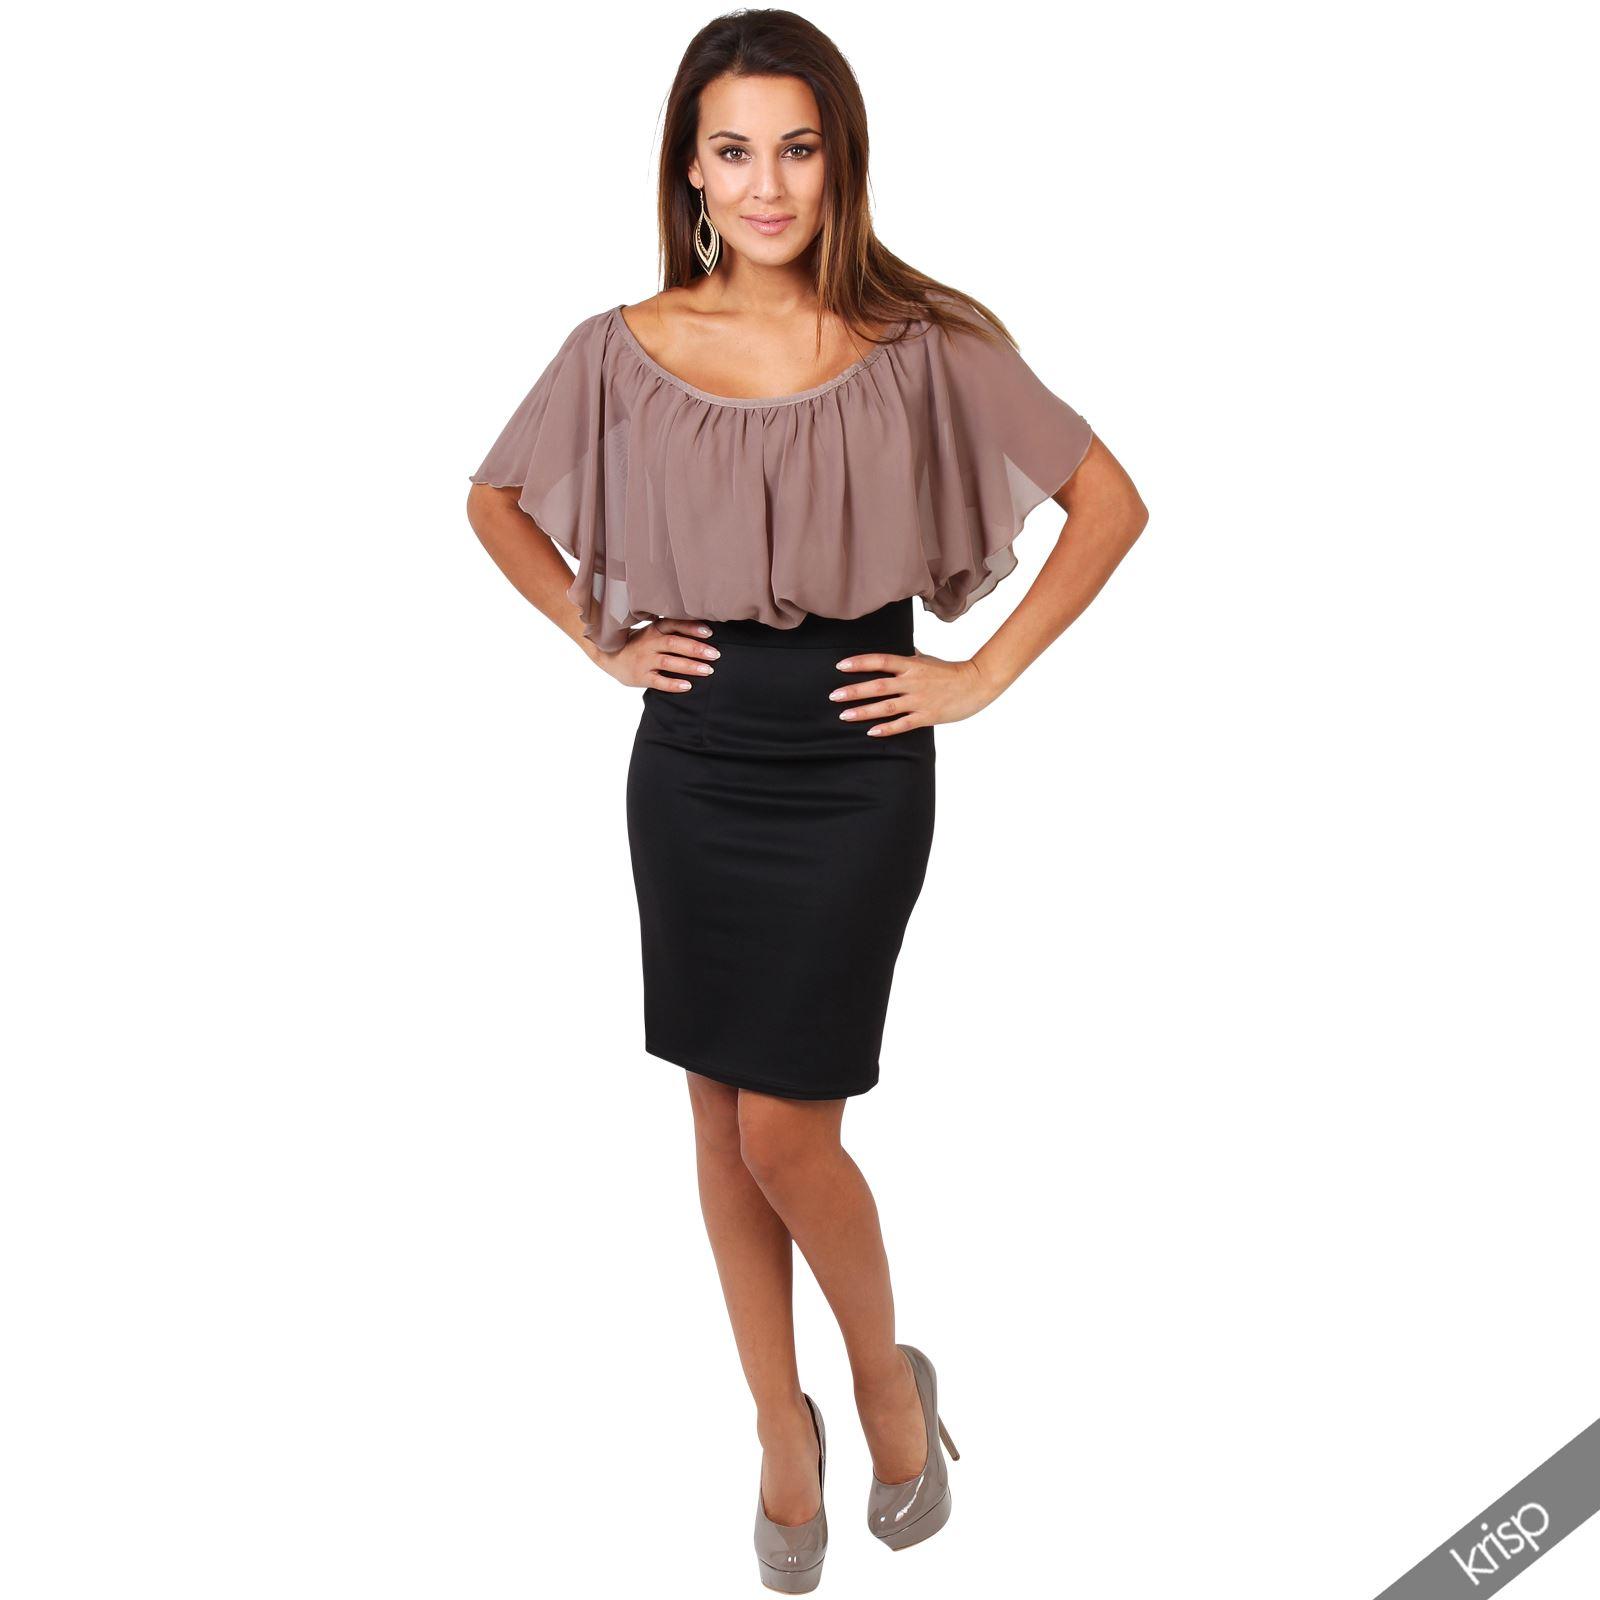 Womens-Pleated-Chiffon-Batwing-Top-High-Waist-Pencil-Bodycon-Skirt-Mini-Dress thumbnail 17